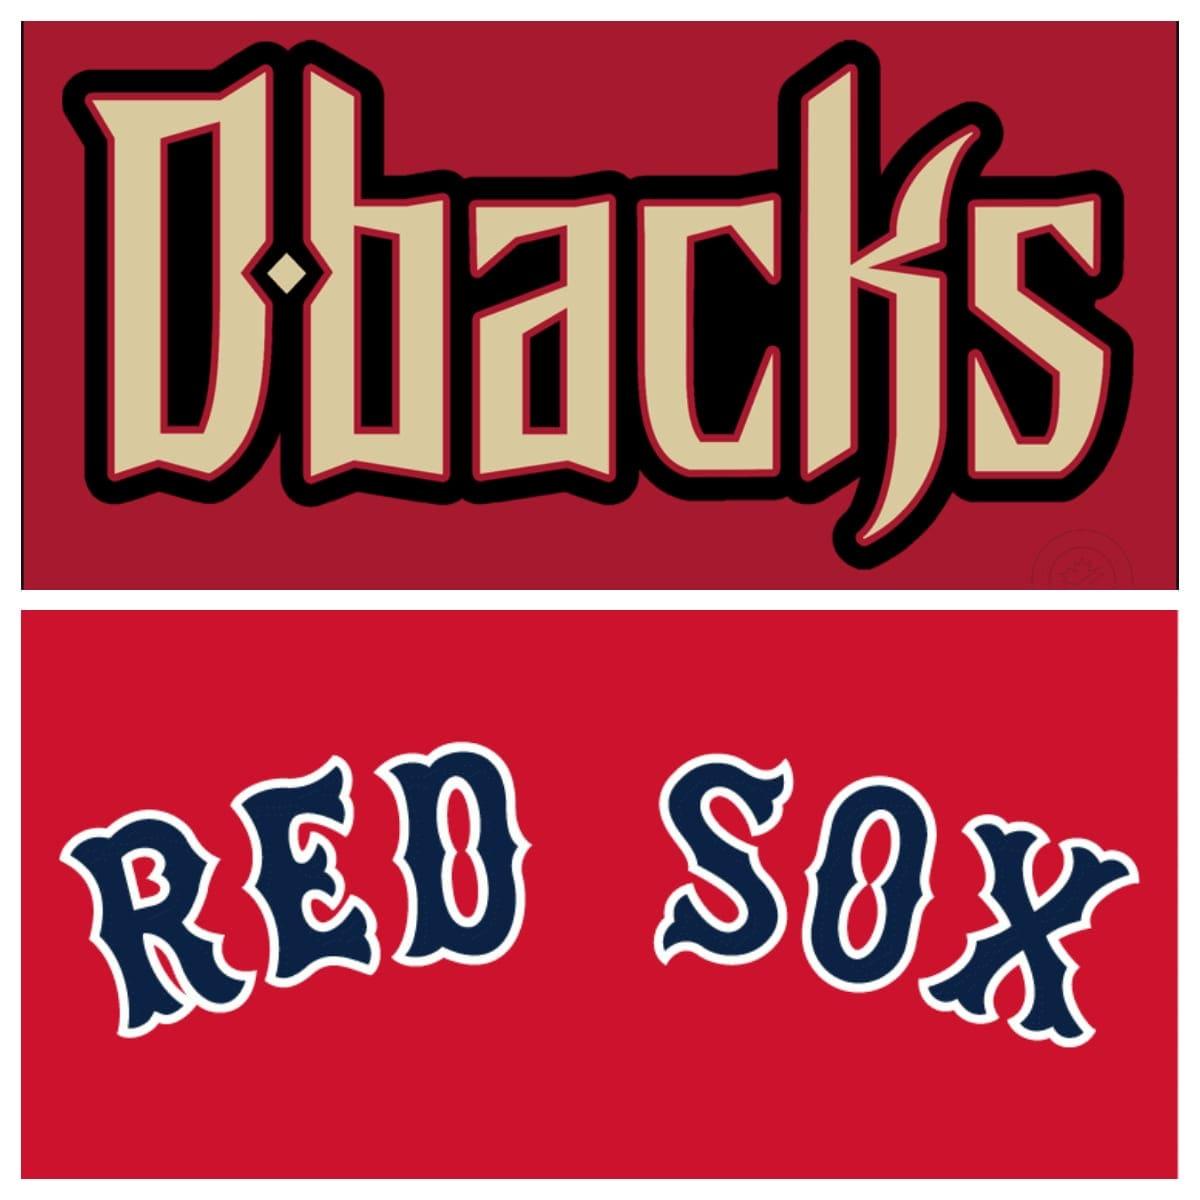 Arizona Diamondbacks vs Boston Red Sox Stats